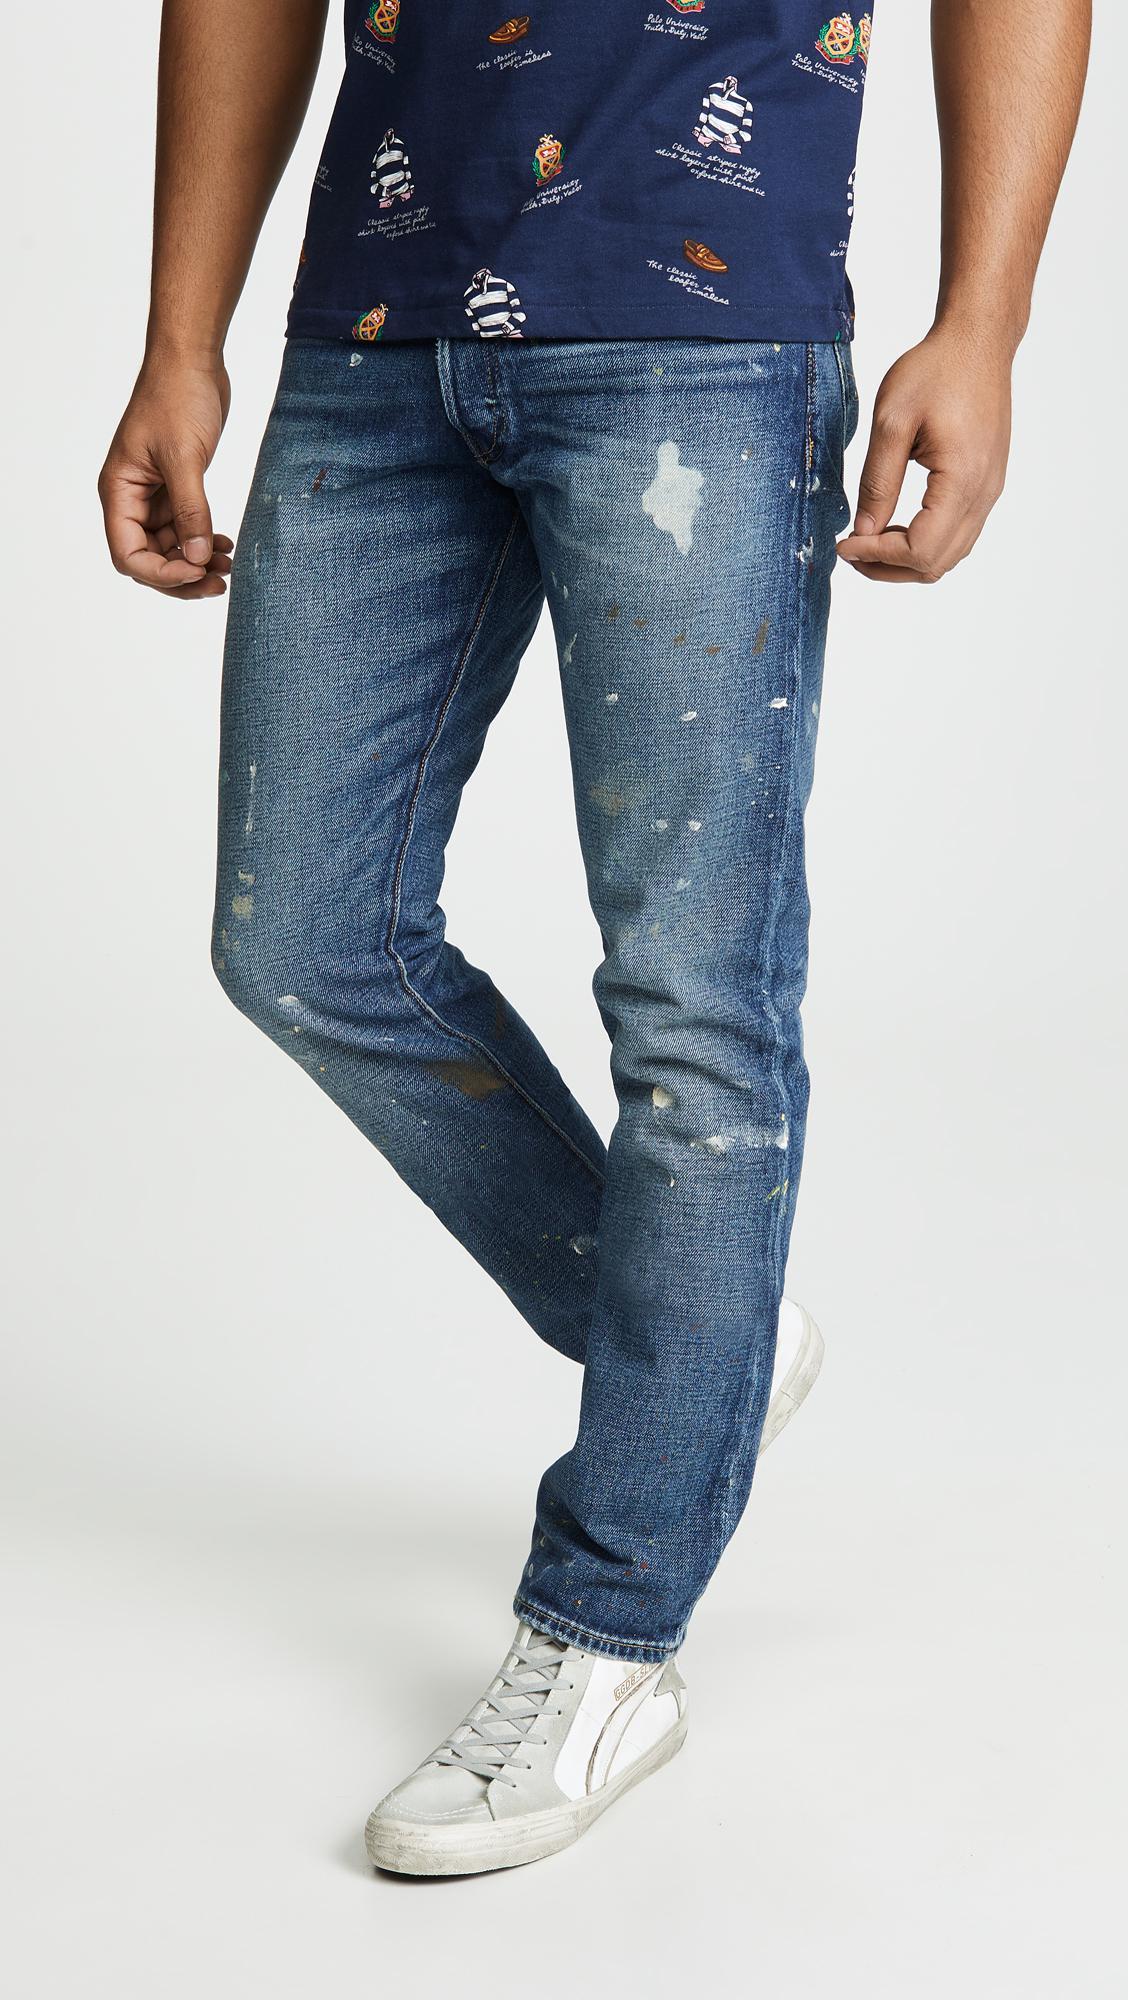 5d554b66e Lyst - Polo Ralph Lauren Sullivan Slim Stretch Jeans in Blue for Men